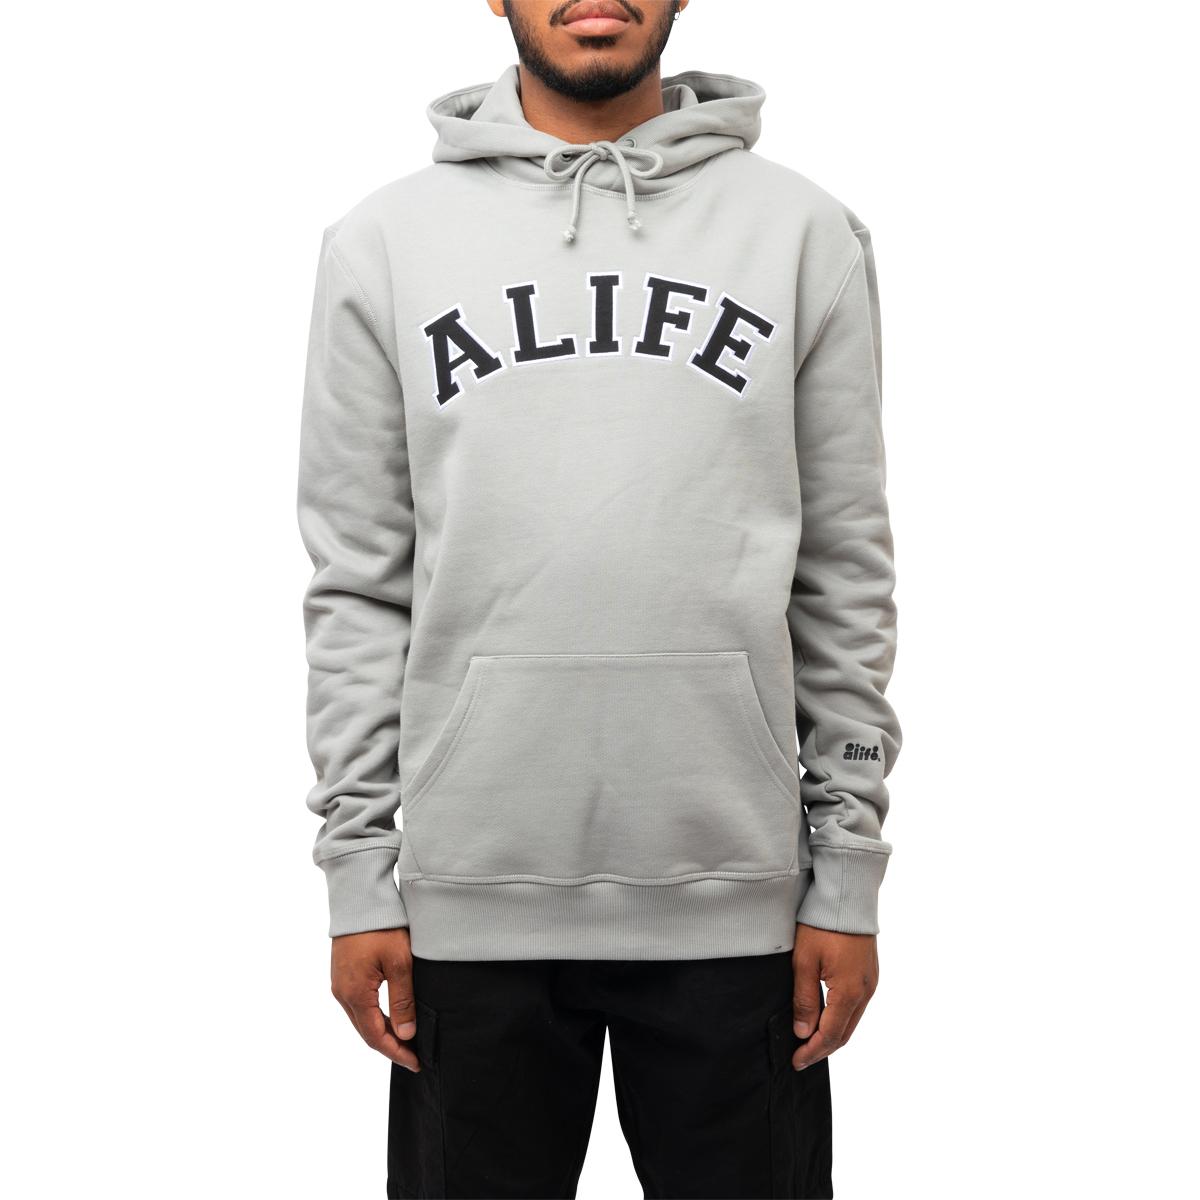 Alife Collegiate Hoodie